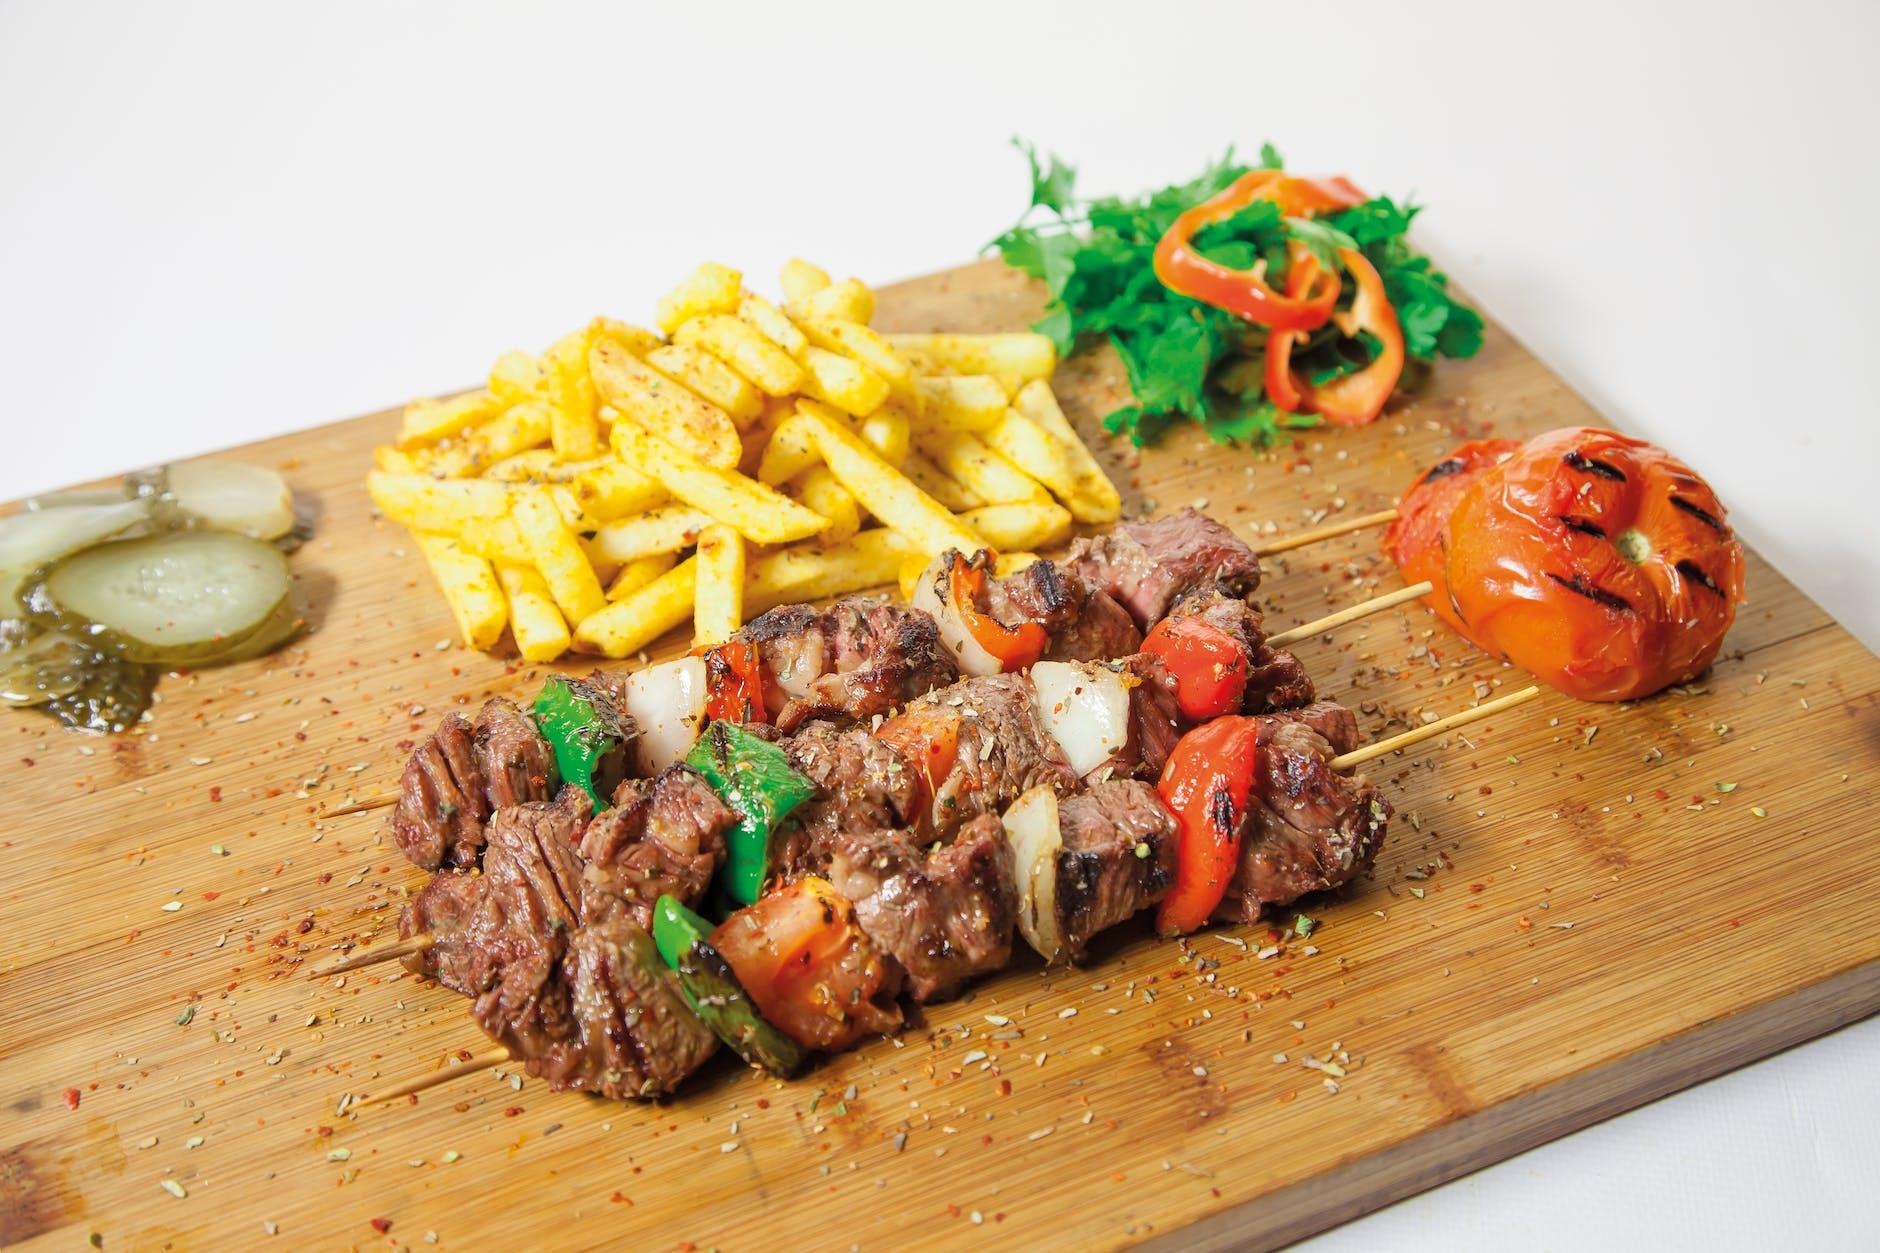 Advantages & Disadvantages Of Arab Street Food